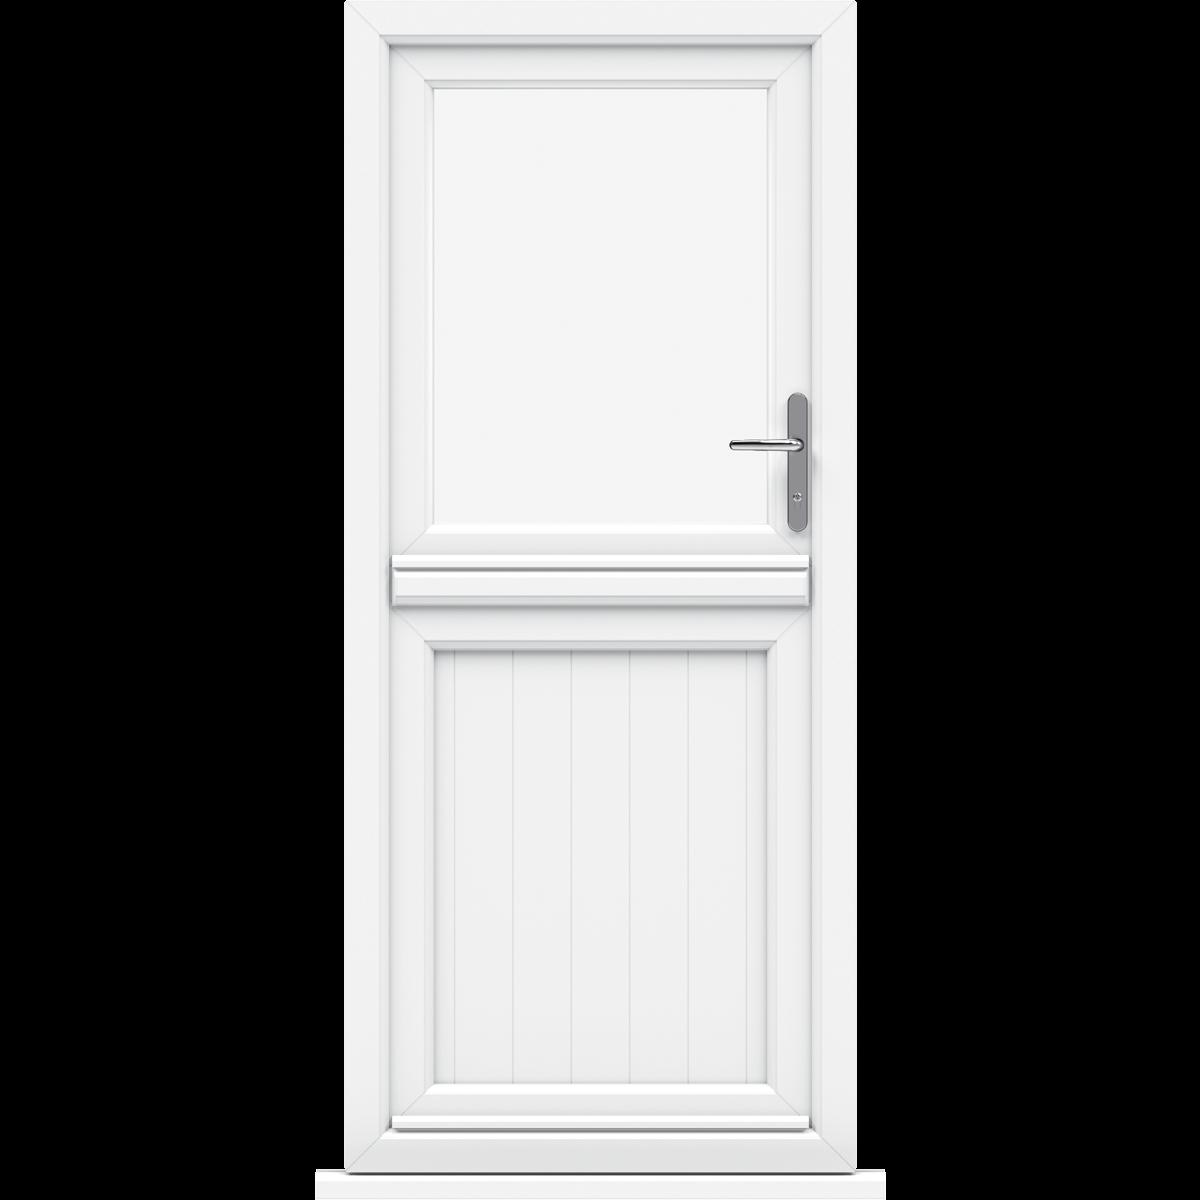 Double front doors upvc georgian upvc entrance door doors for Upvc double front exterior doors